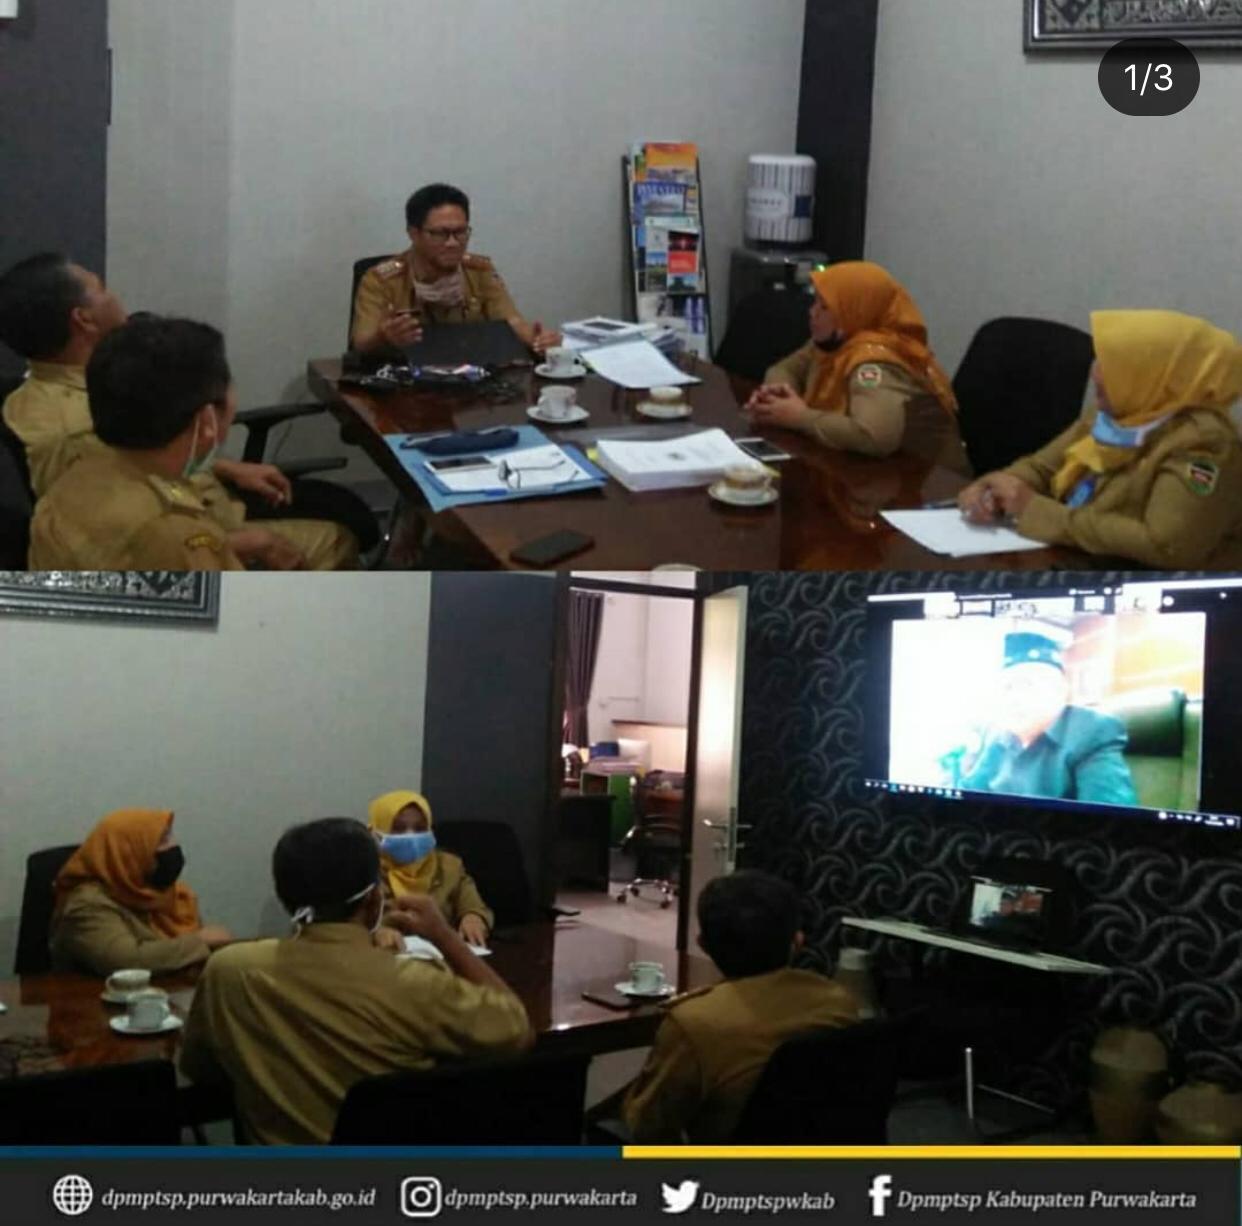 Rapat Paripurna DPRD tentang Penyampaian Laporan Keterangan Pertanggung Jawaban (LKPJ) Bupati Akhir Tahun 2019 di Ruang Kepala DPMPTSP Purwakarta.